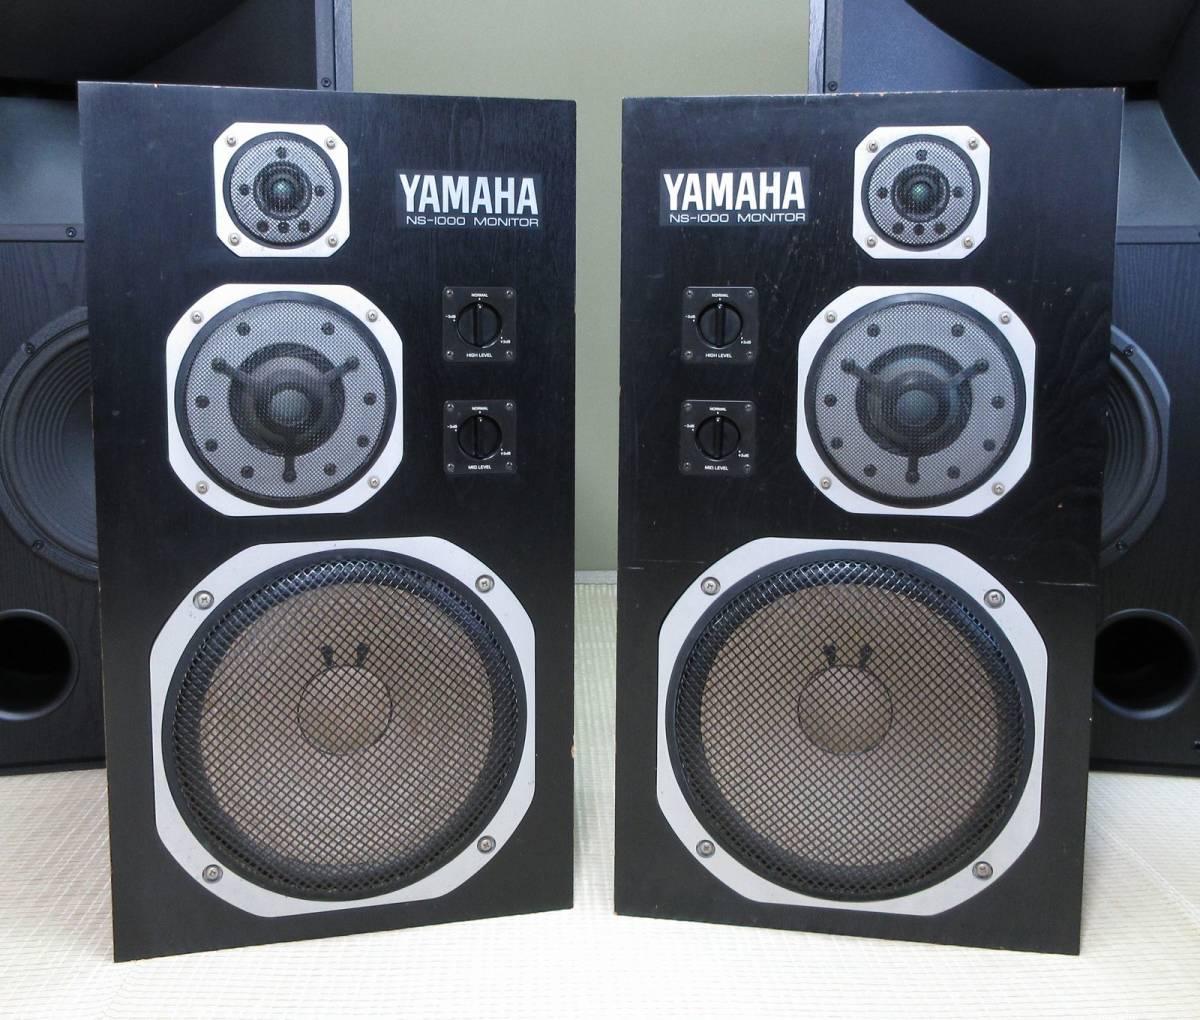 YAMAHA NS-1000M MONITOR スピーカー ペア ヤマハ 北海道引取限定か落札者様による配送会社の手配_画像3